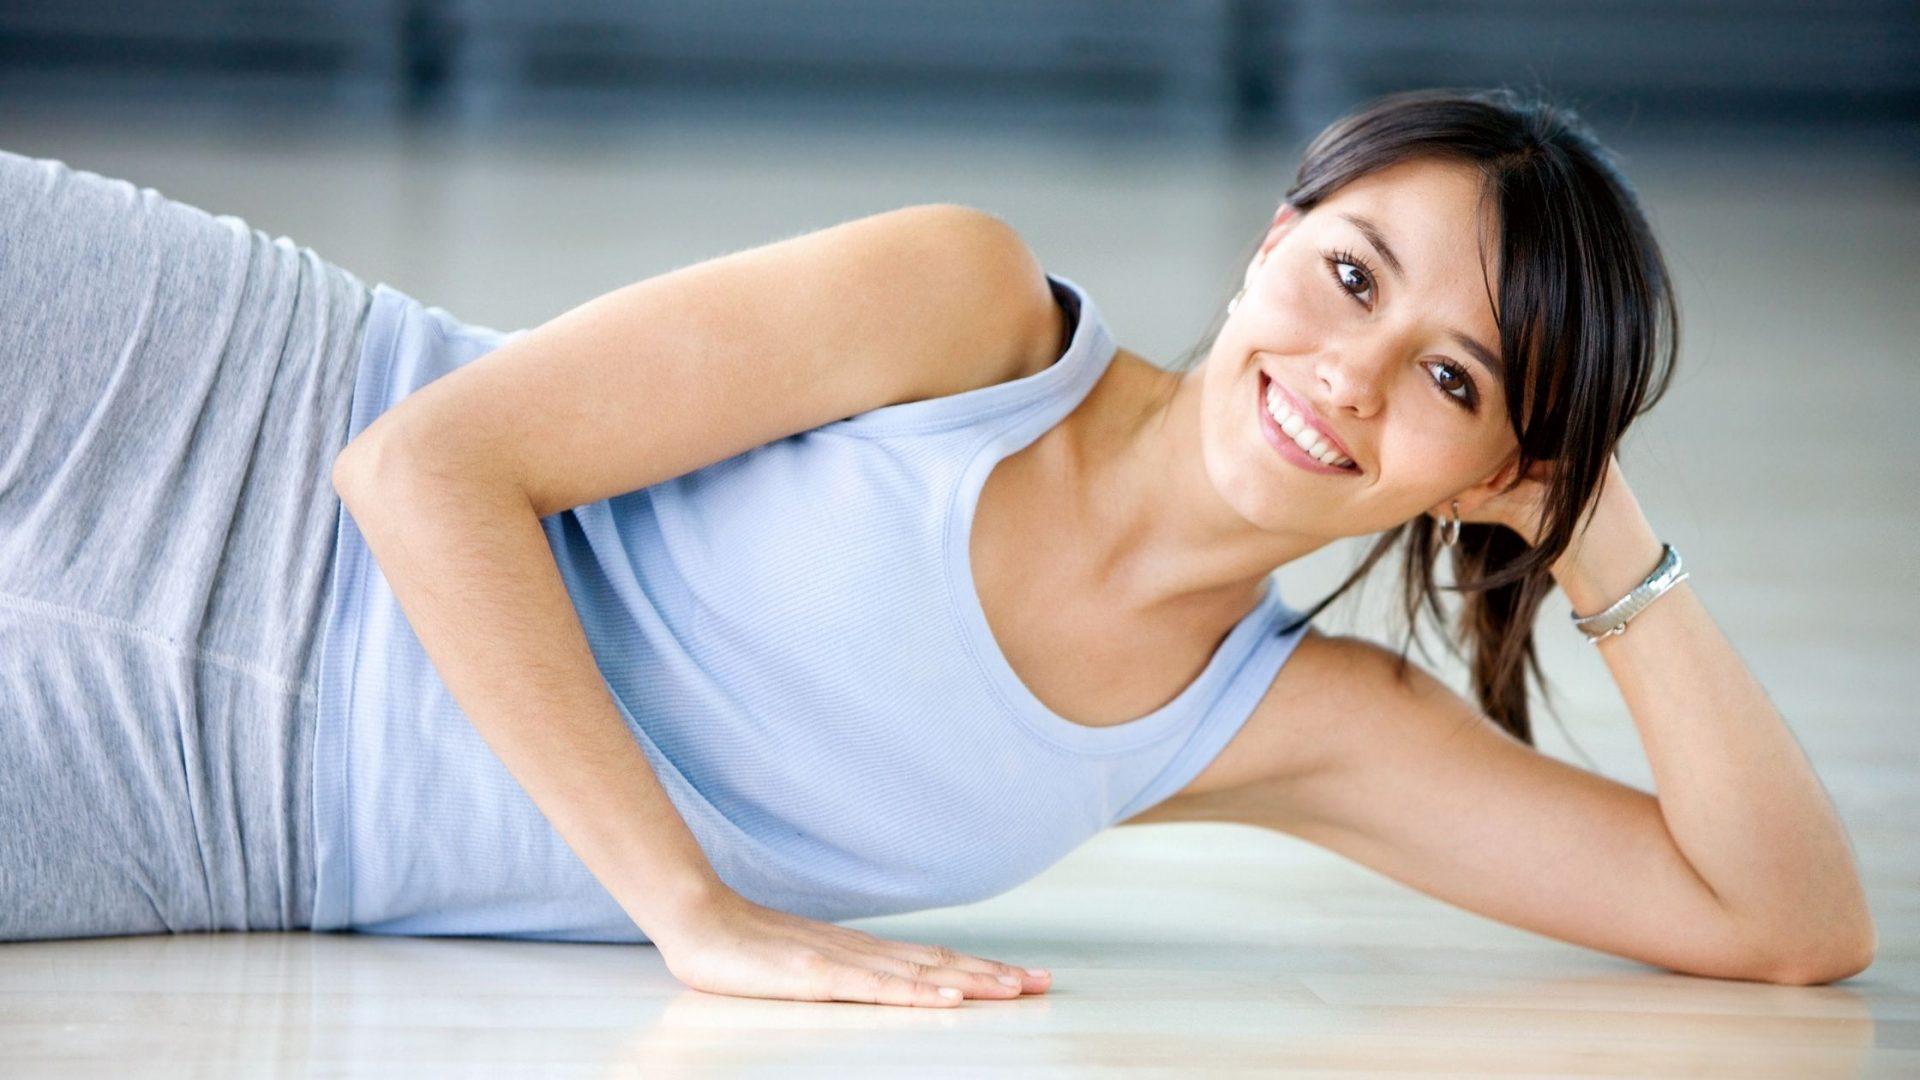 intimate gymnastics for women